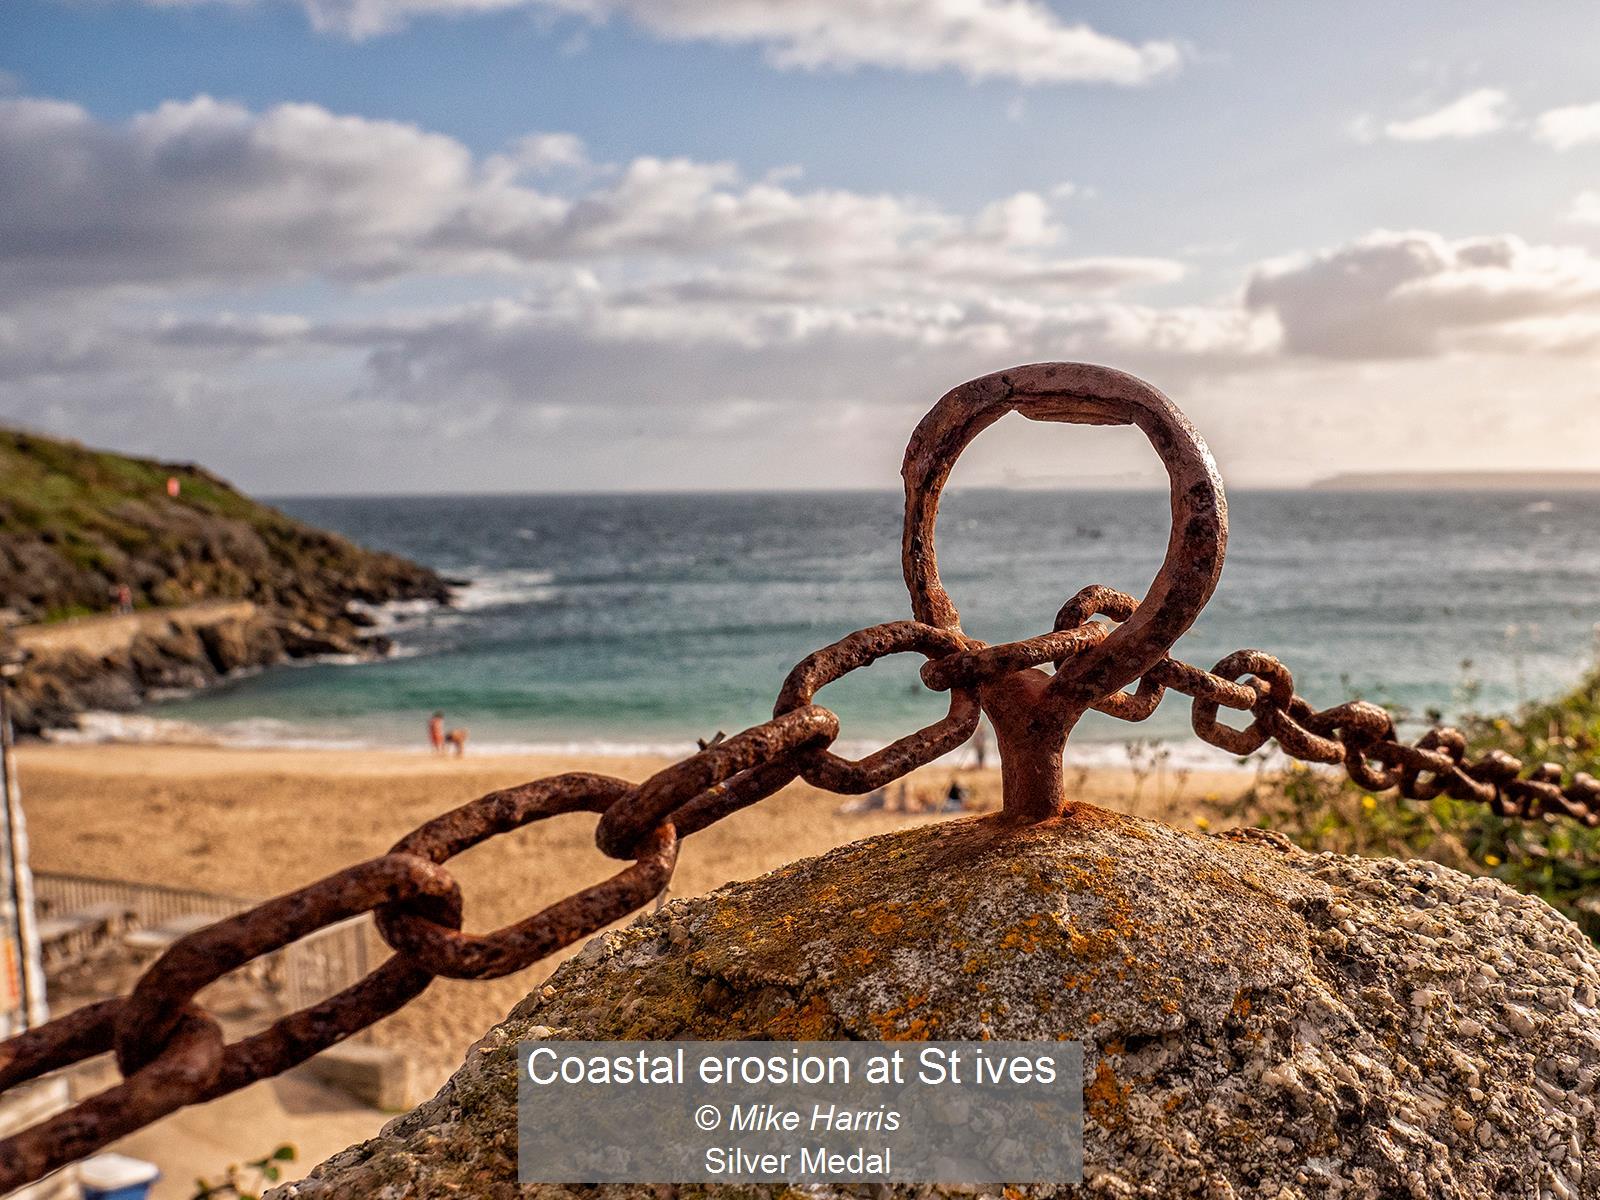 Coastal erosion at St ives_Mike Harris_S